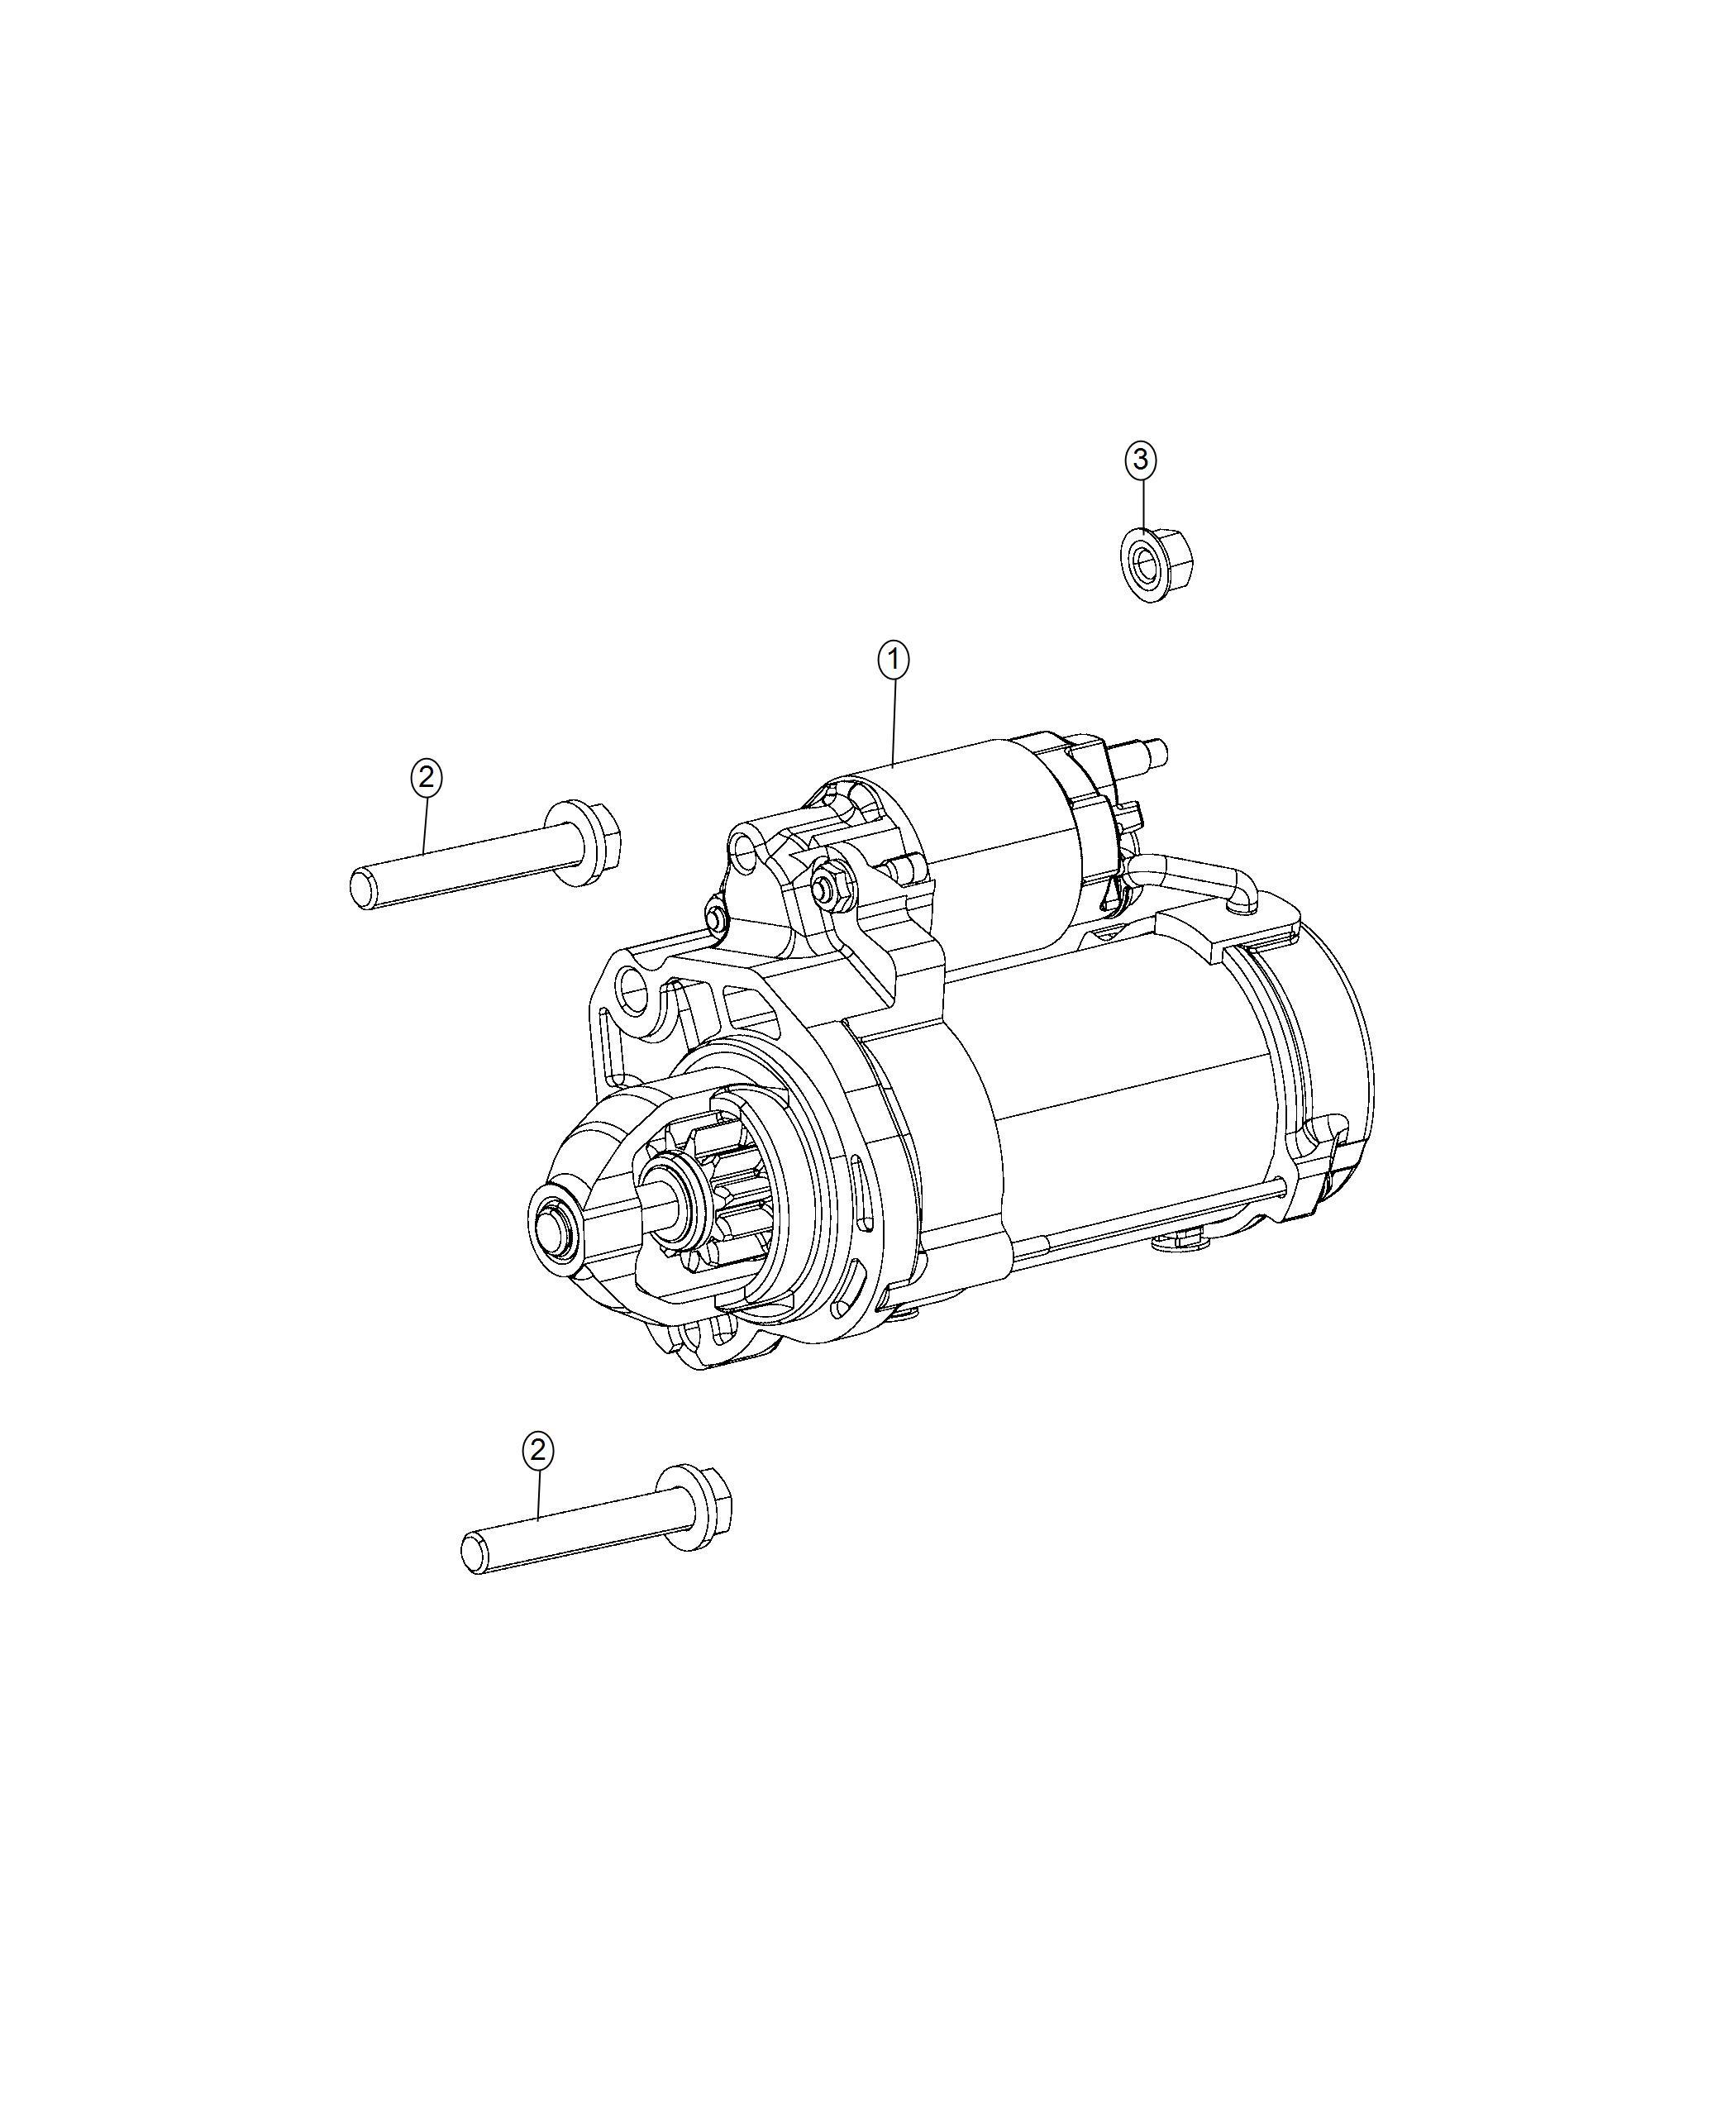 2018 Chrysler Pacifica Starter. Engine. Starters, related